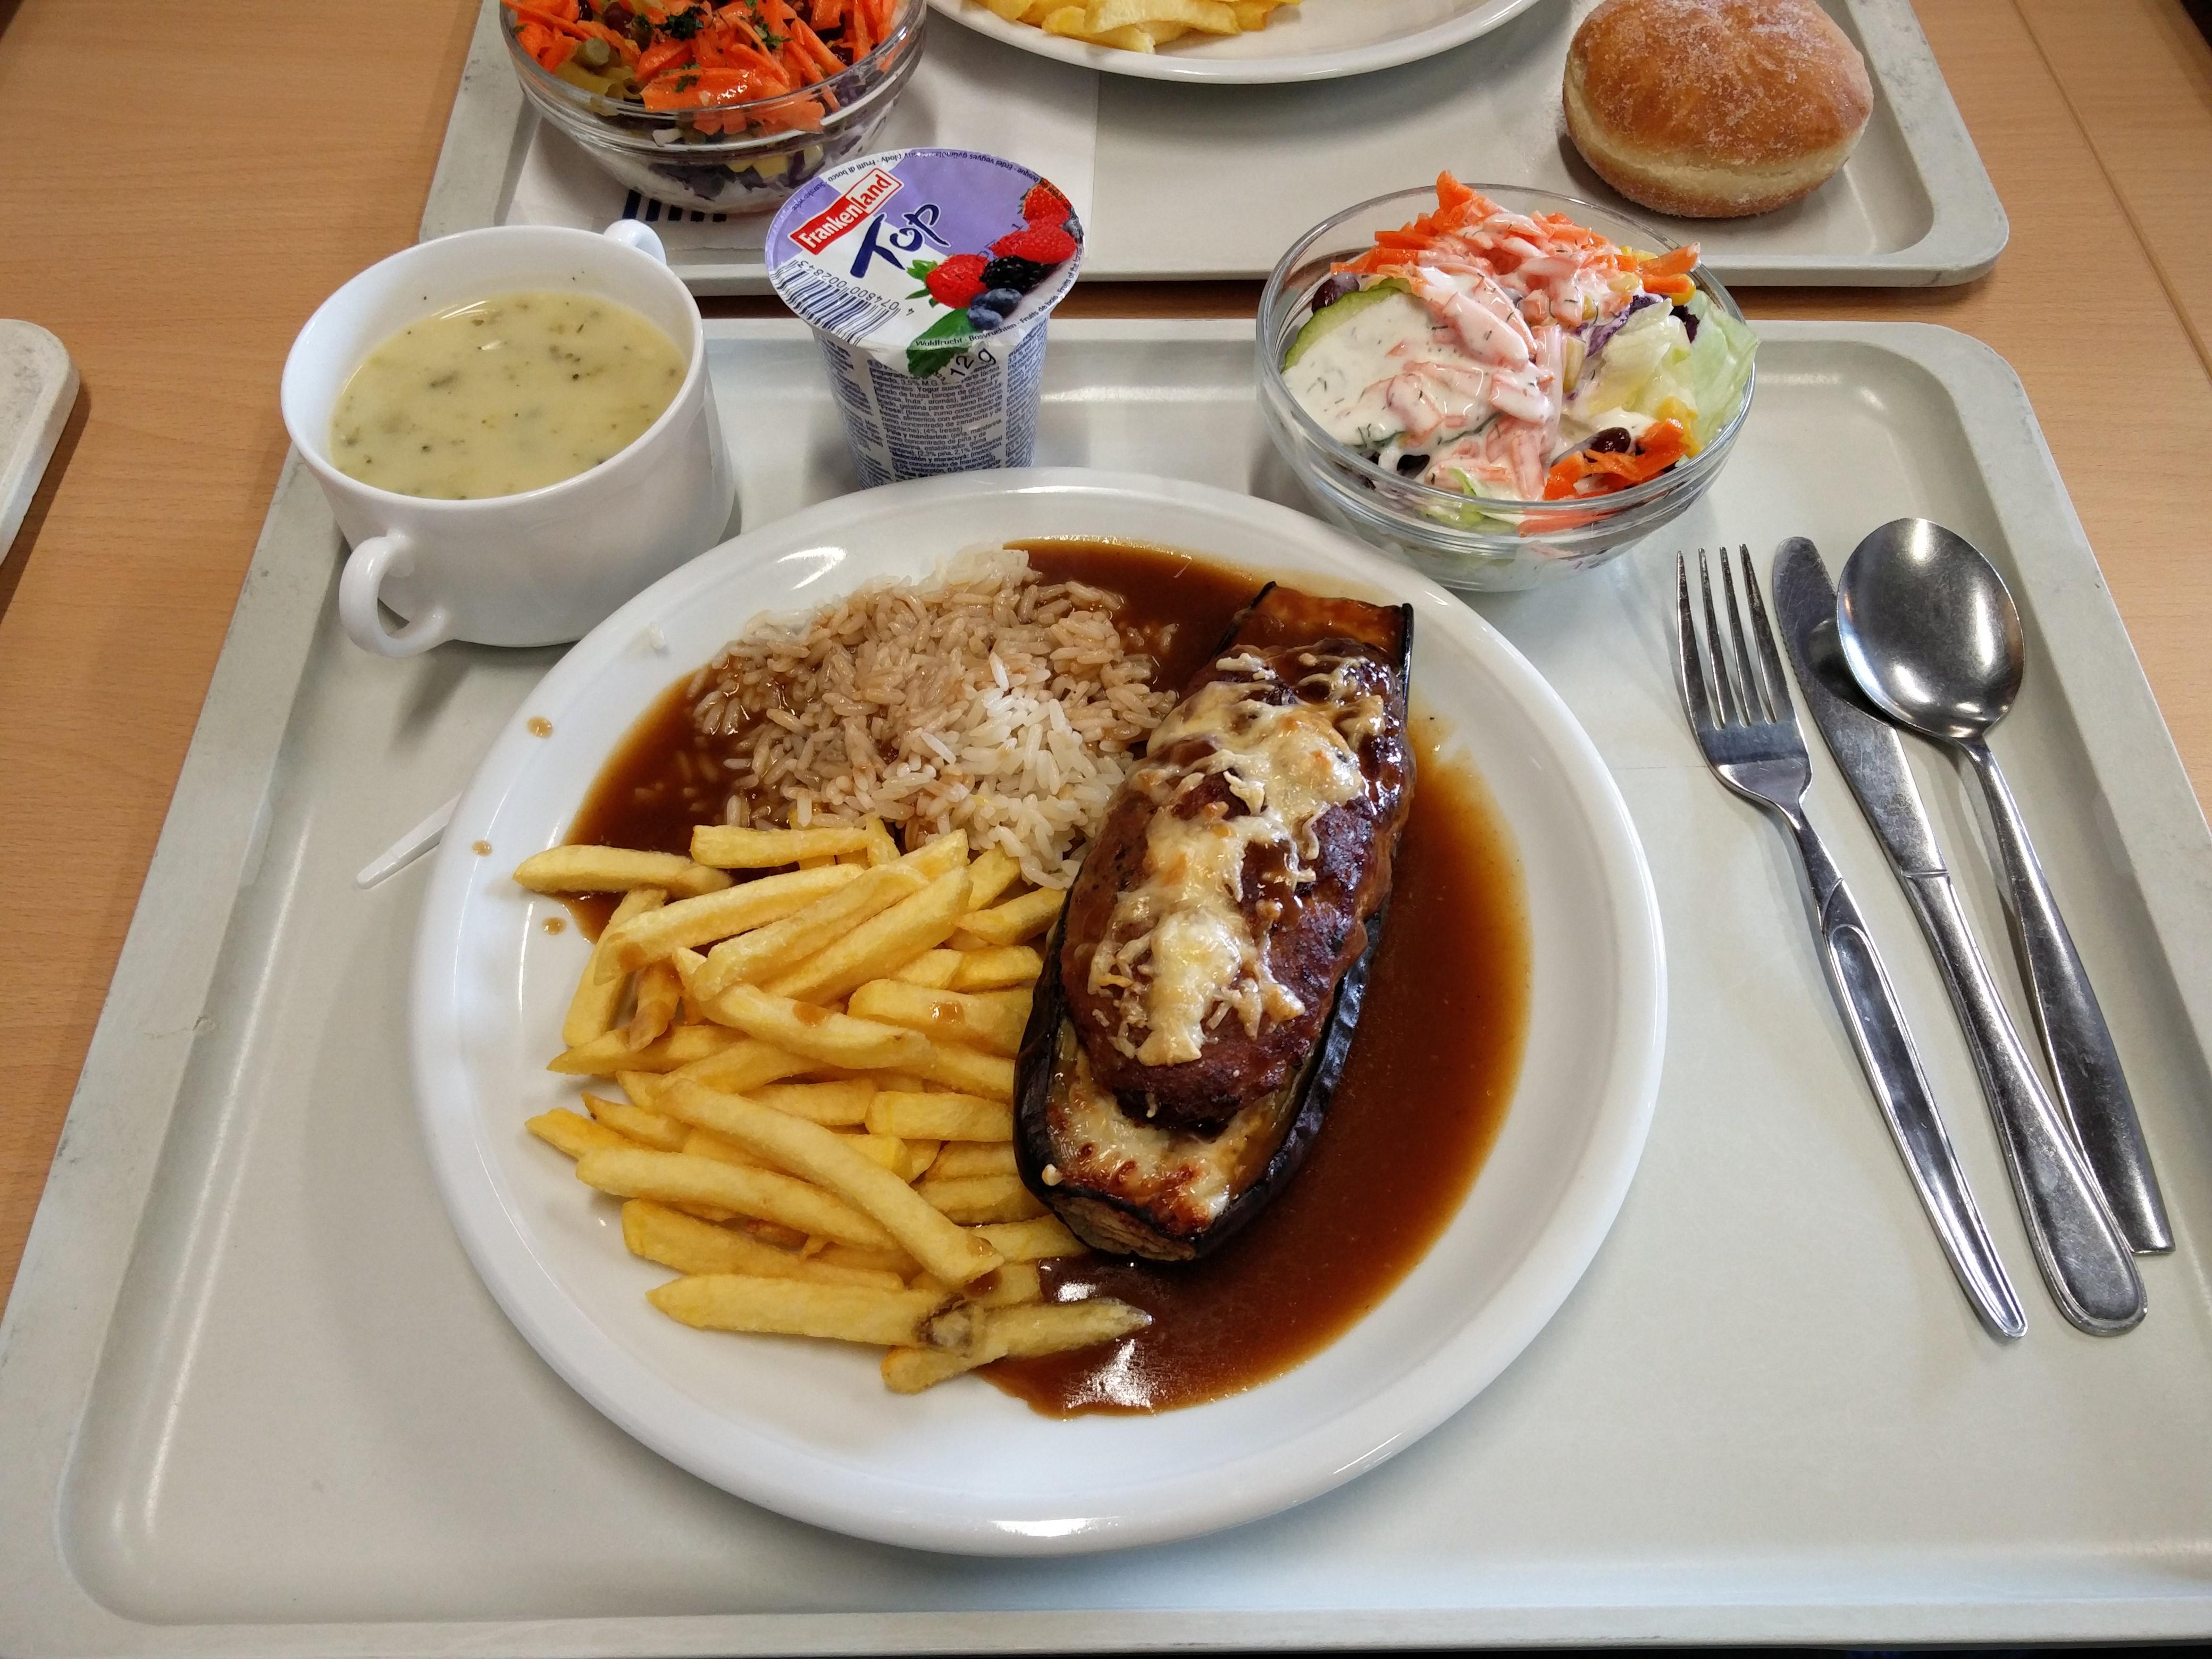 https://foodloader.net/nico_2016-03-24_gefuellte-aubergine-reis-pommes-suppe-salat-joghurt.jpg